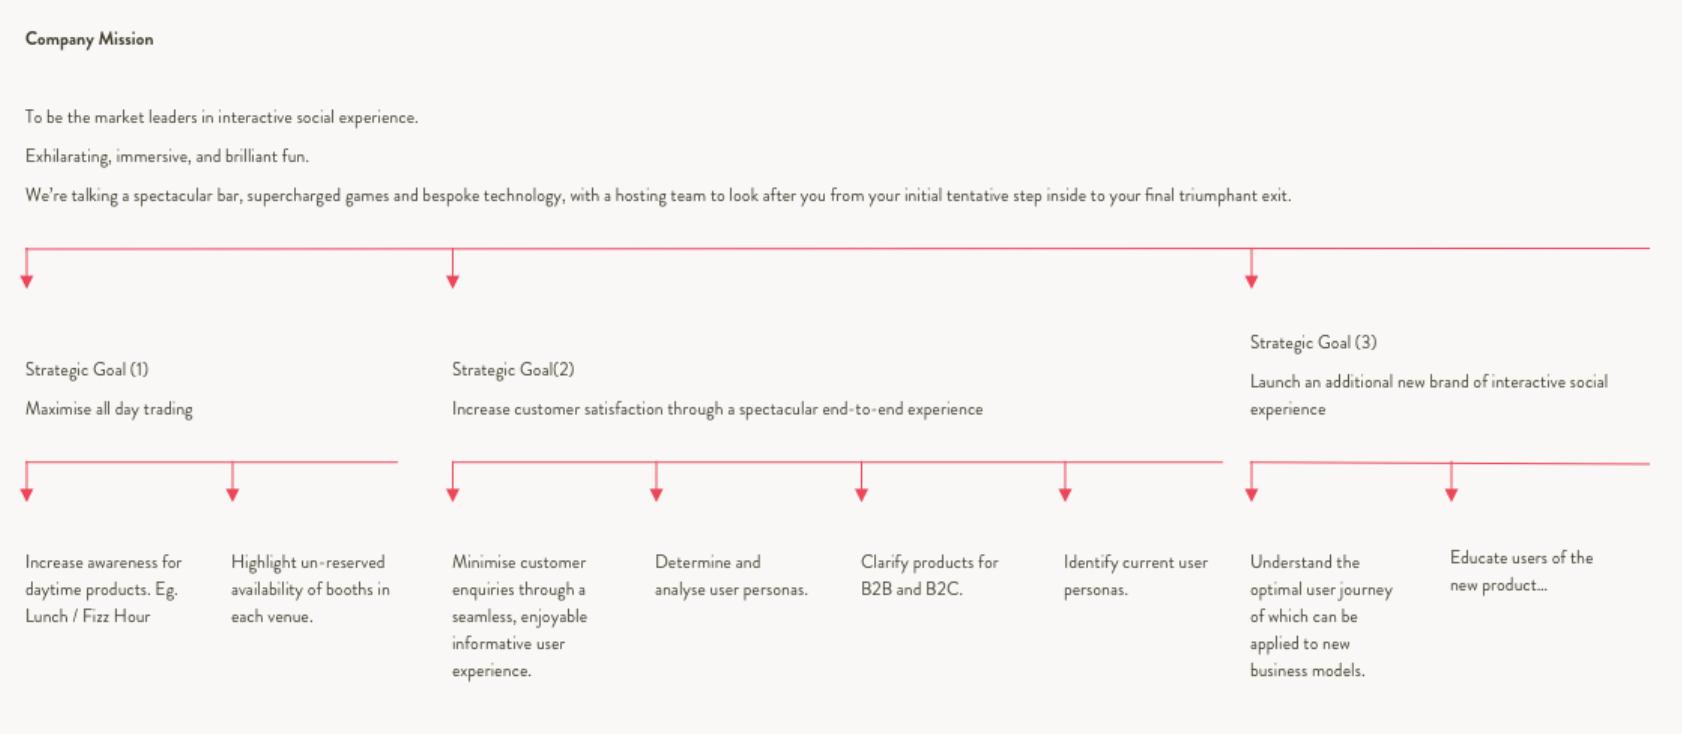 laurengracedesign-freelance-ux-designer-consultant-flight-club-darts-business-goals.png